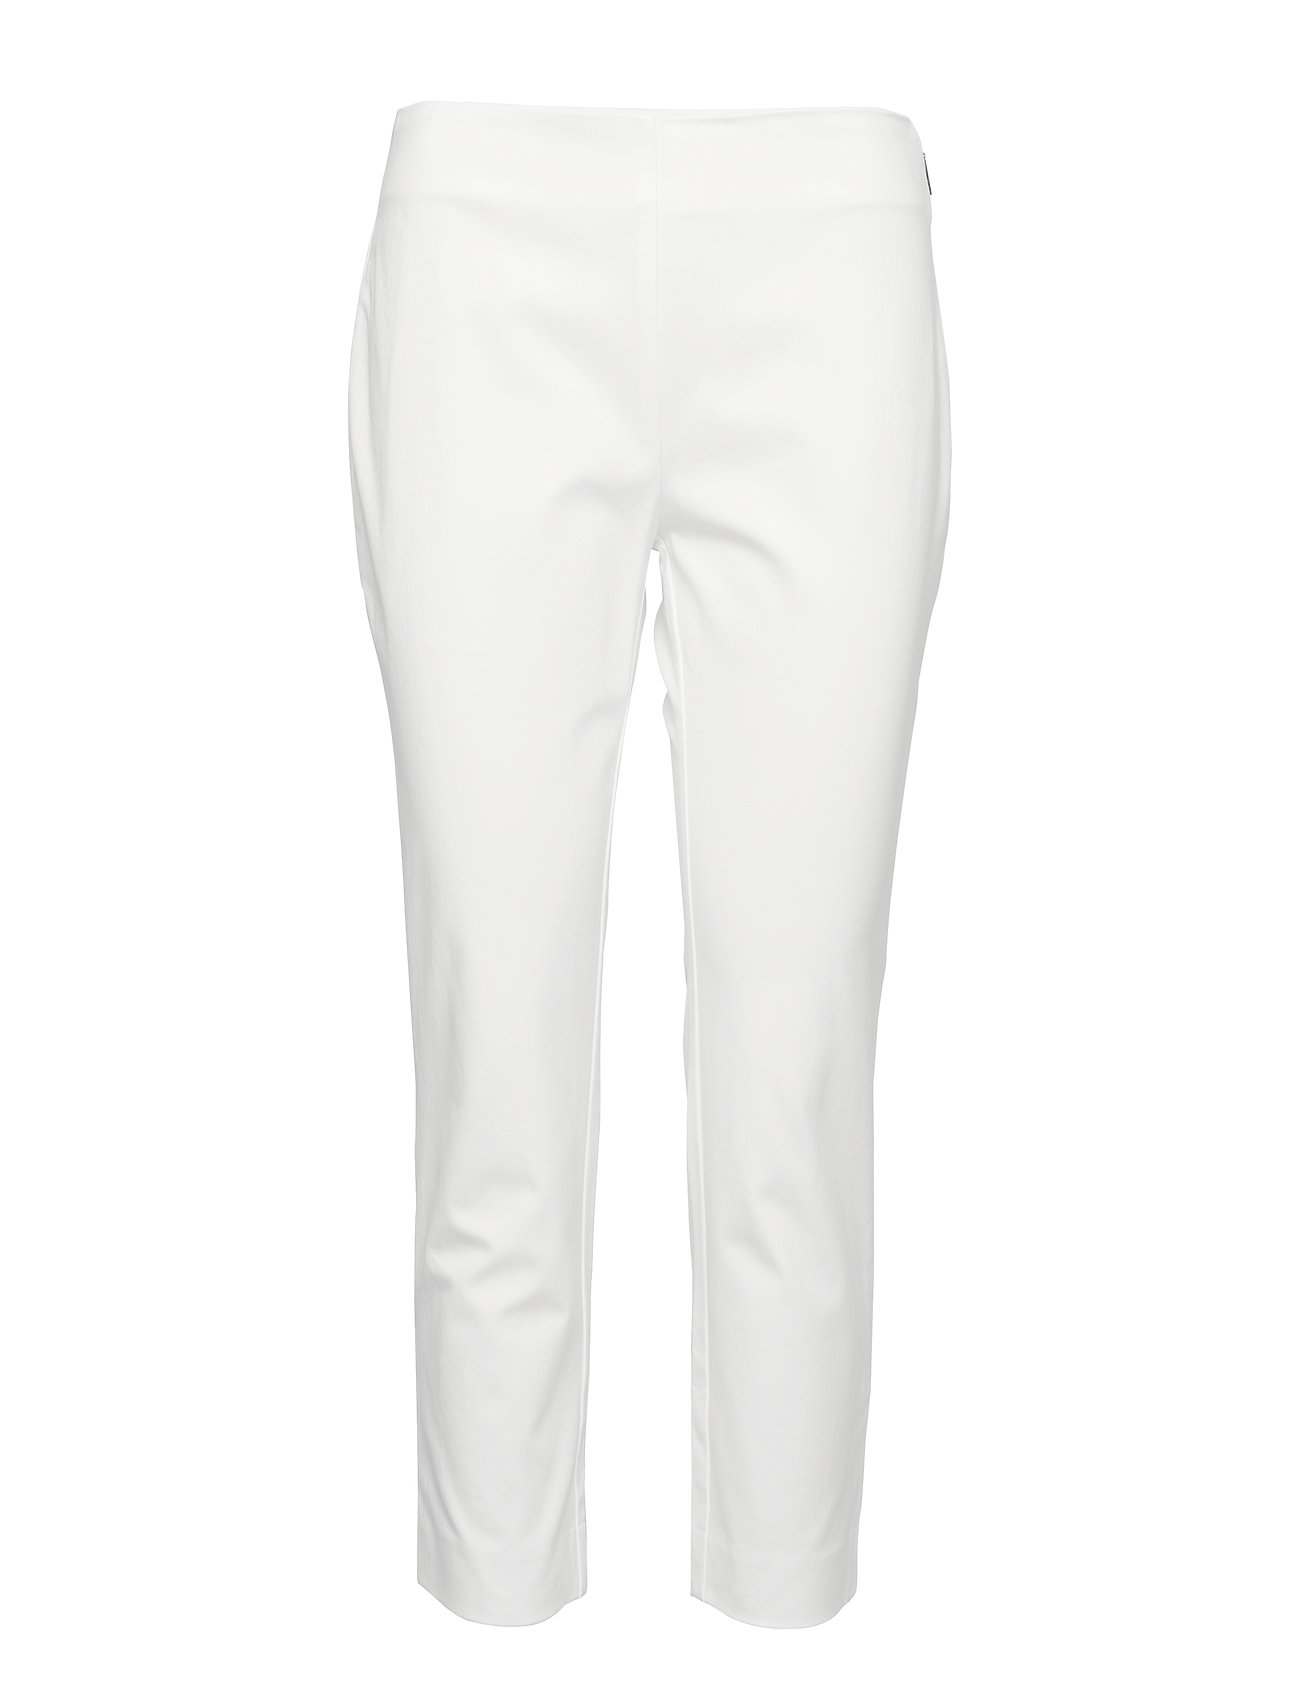 Lauren Ralph Lauren Twill Skinny Pant - WHITE